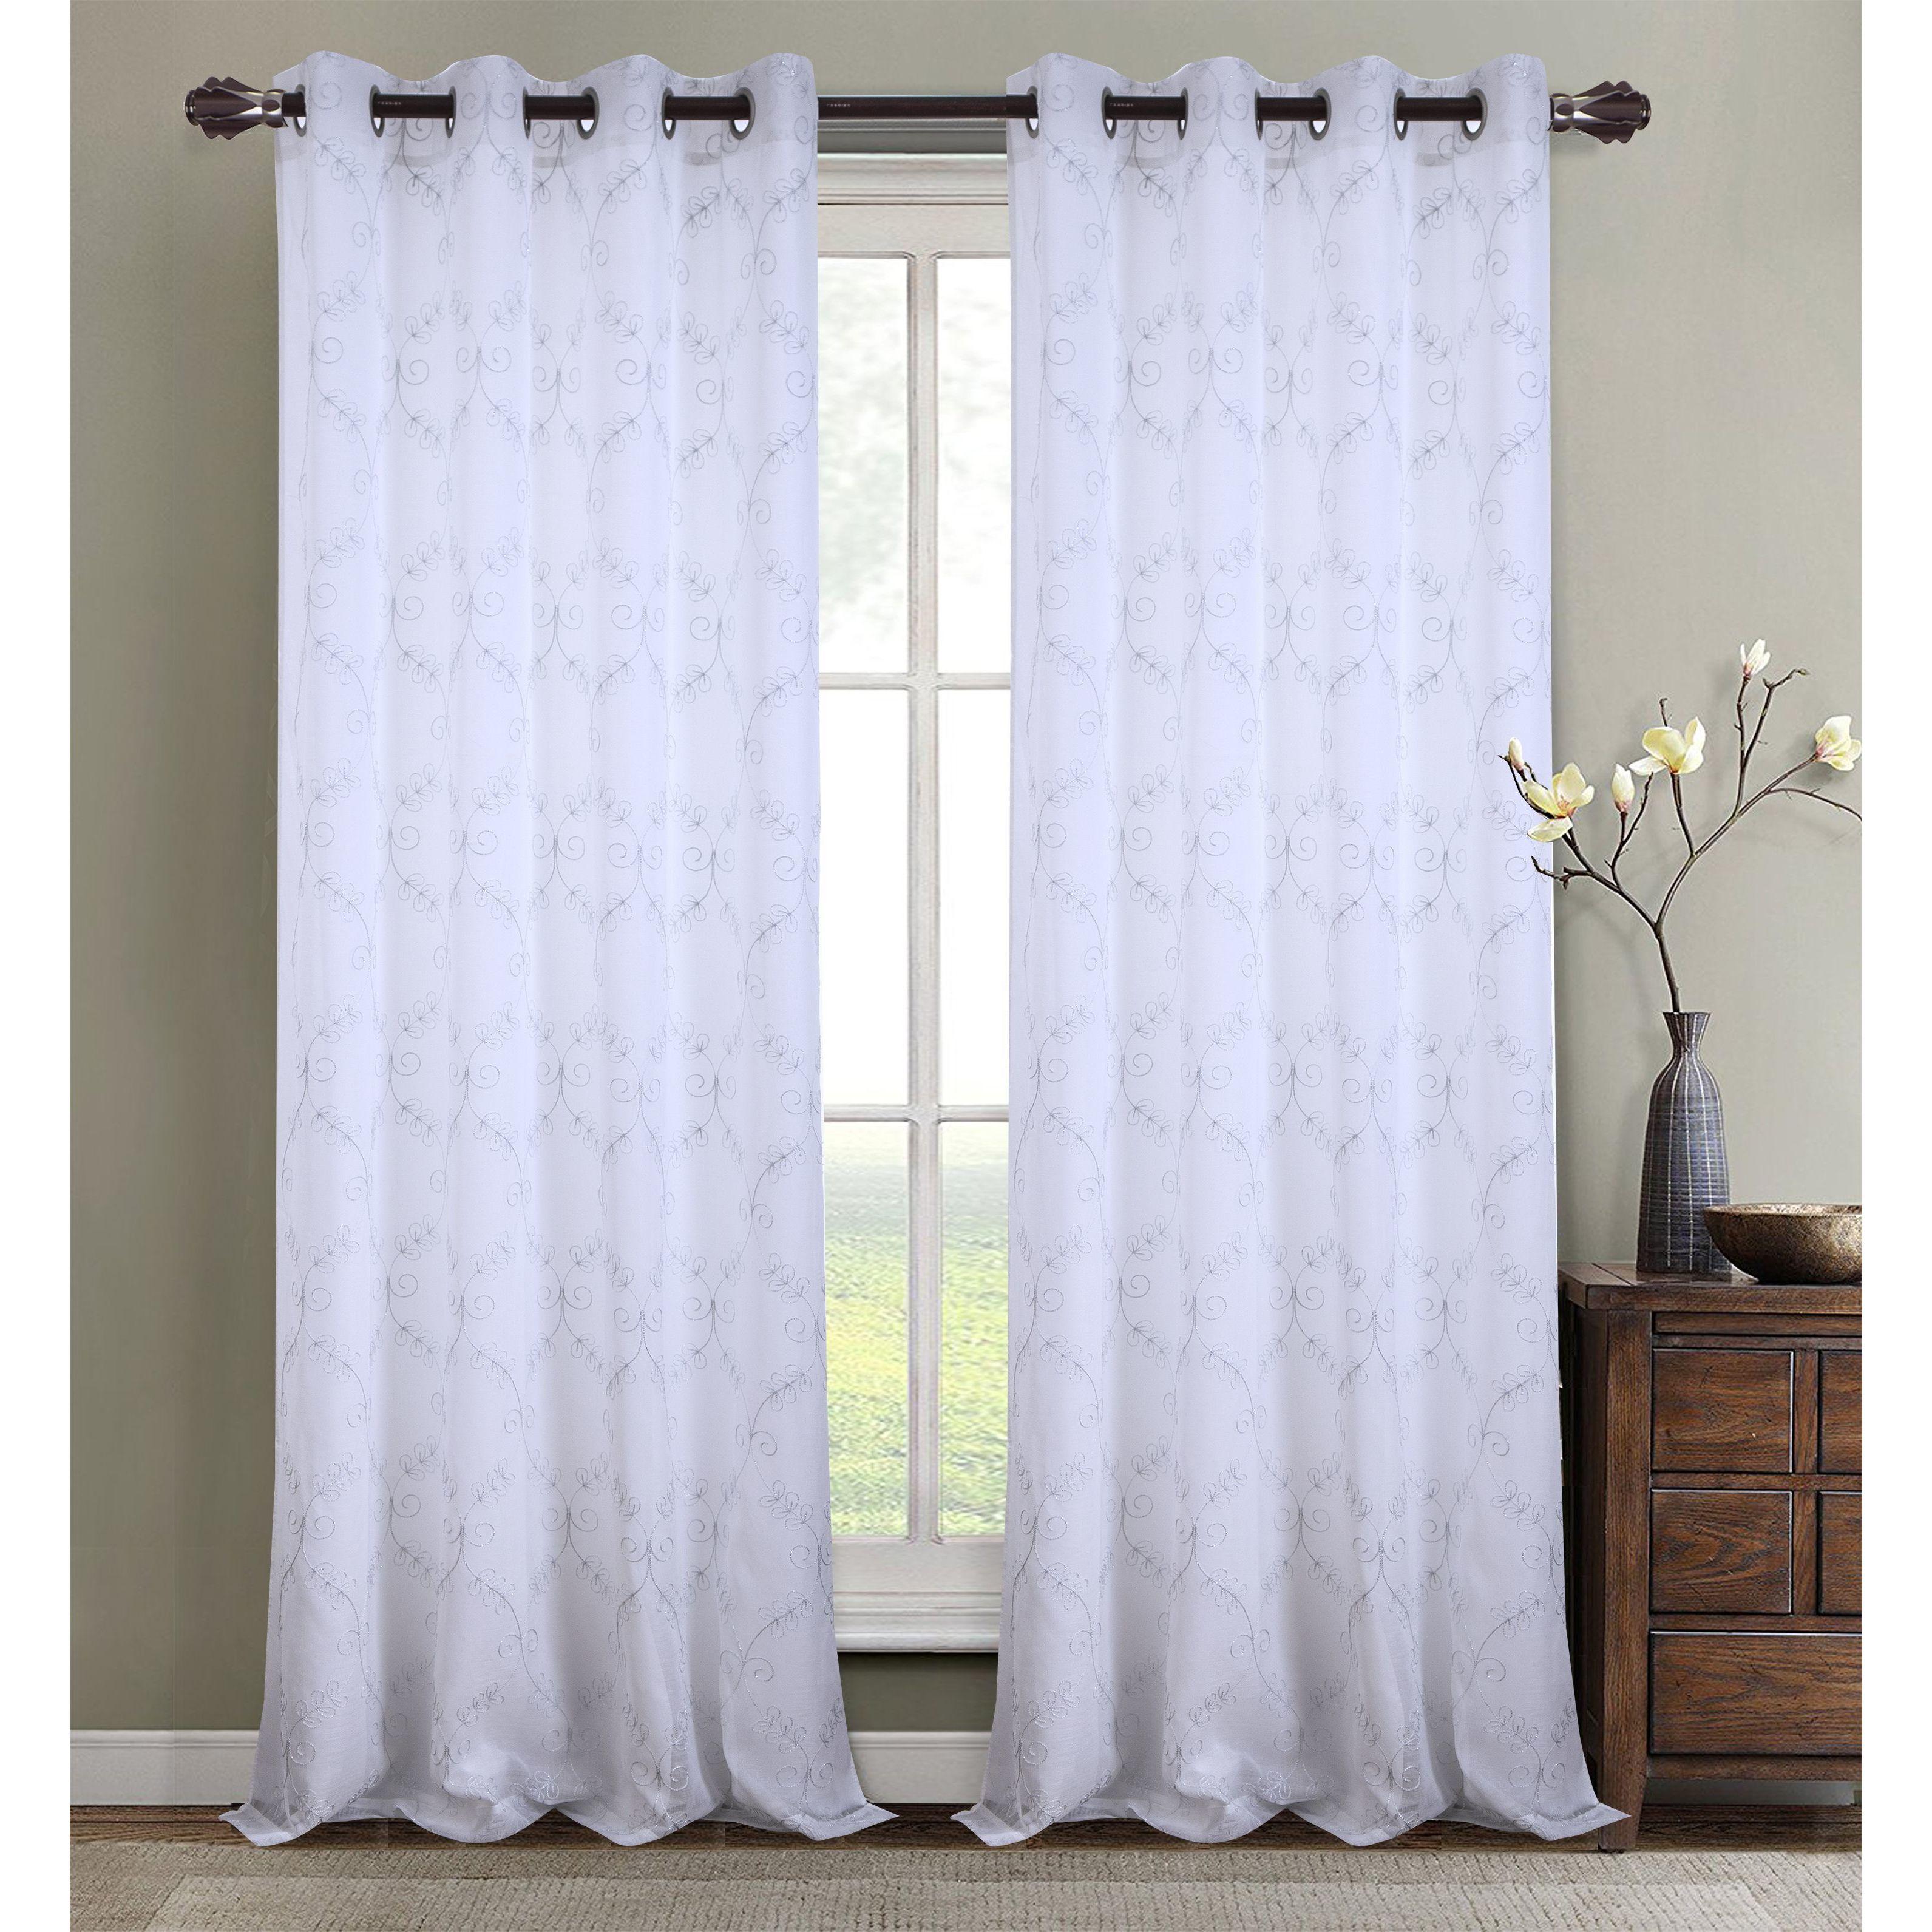 window sheer treatments elements valance curtain geometric wayfair pdp ca reviews grommet lattice panels